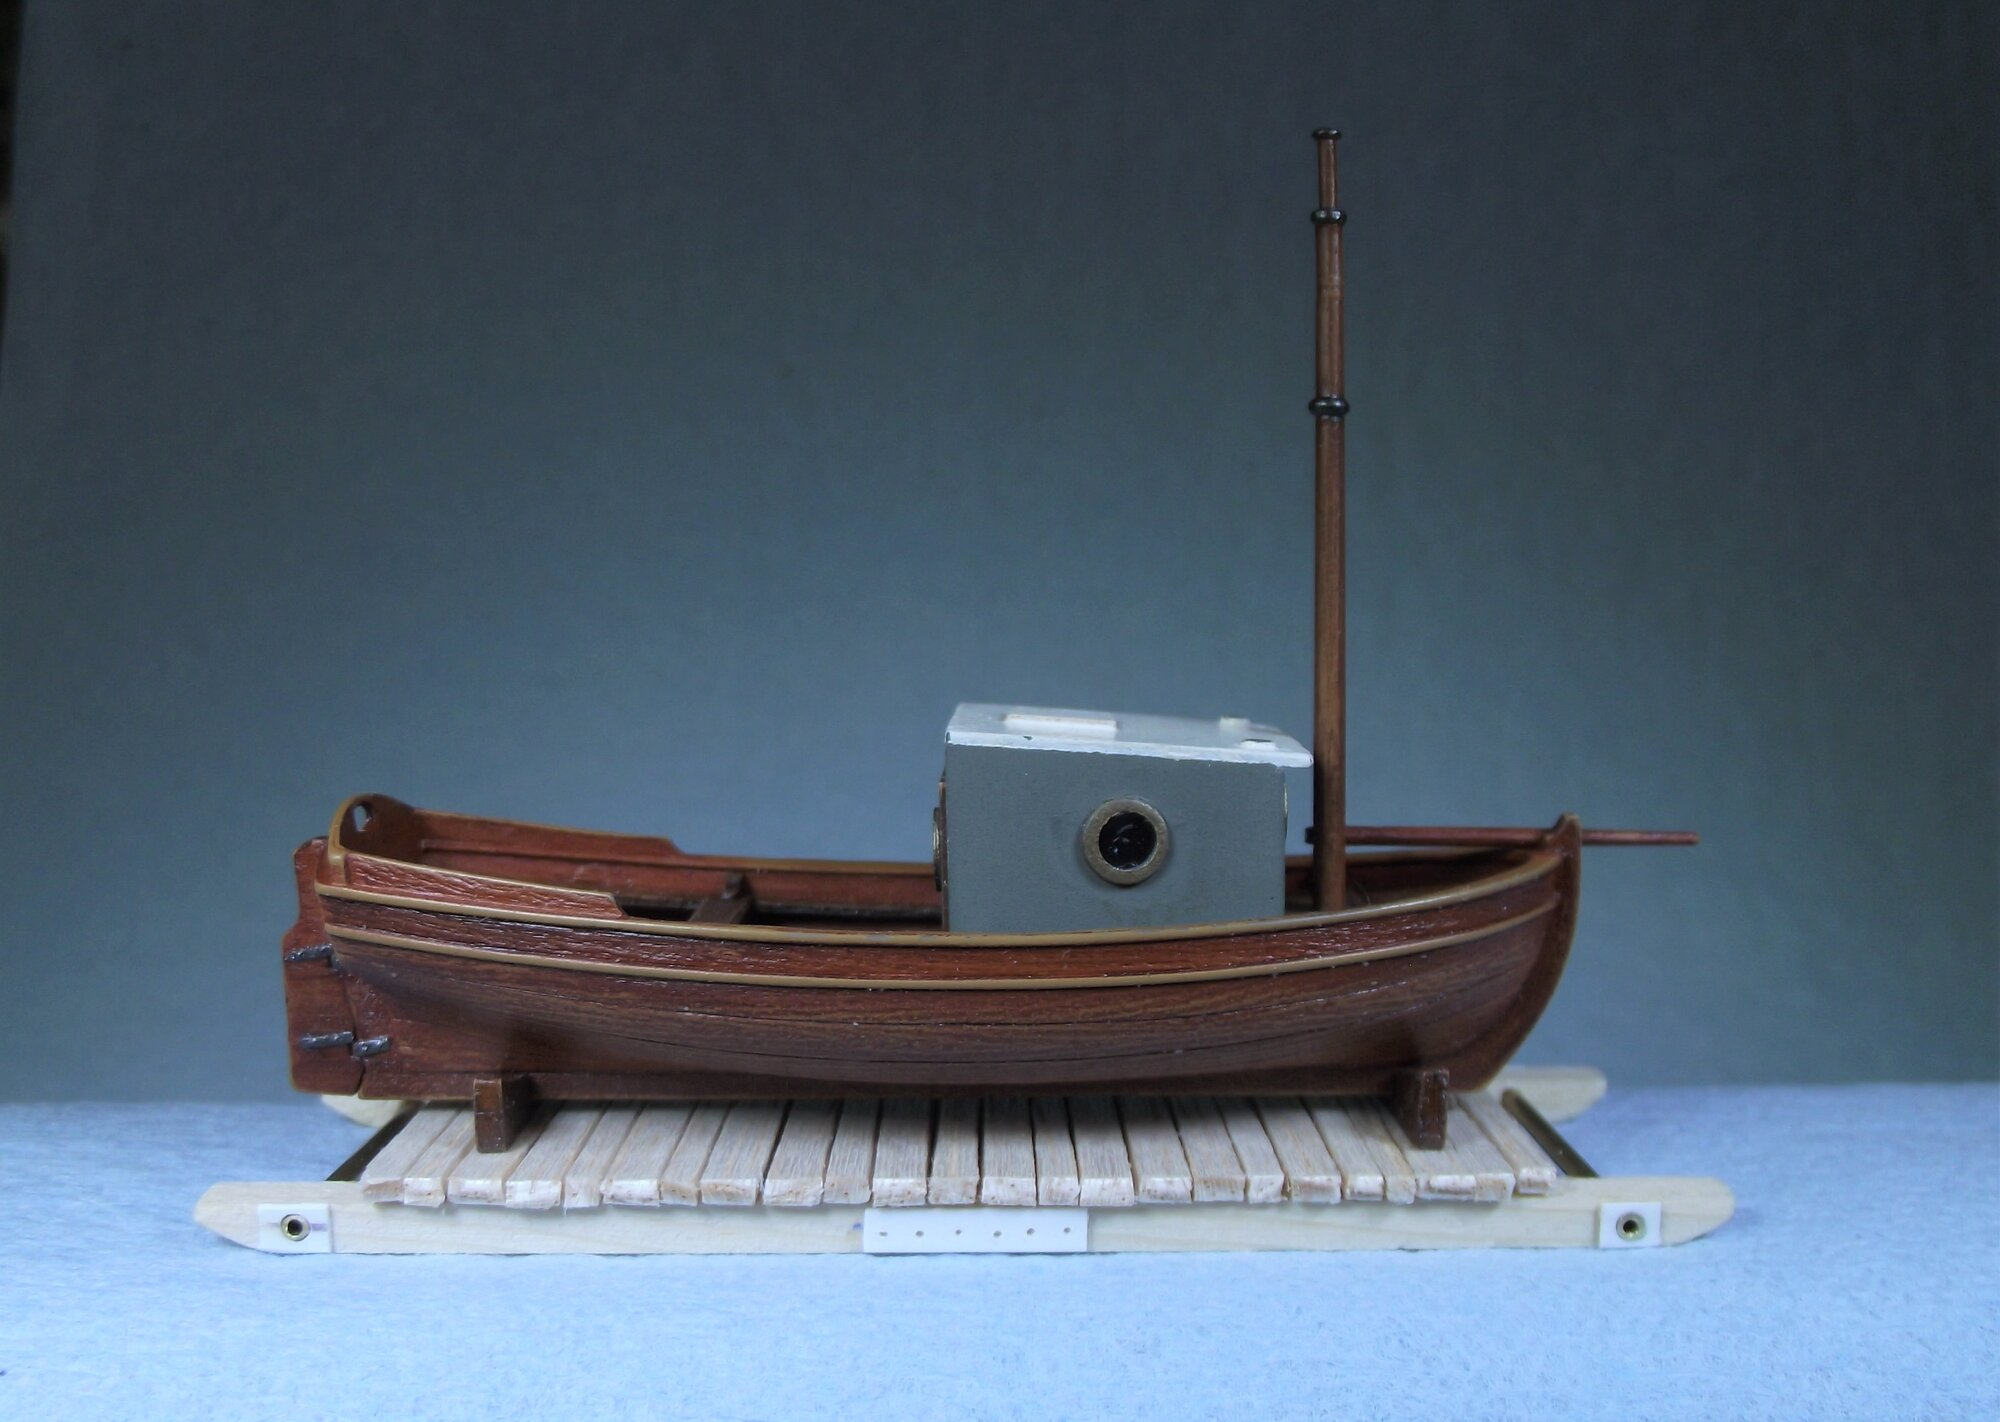 Boat_05-09-2021 (1).jpg